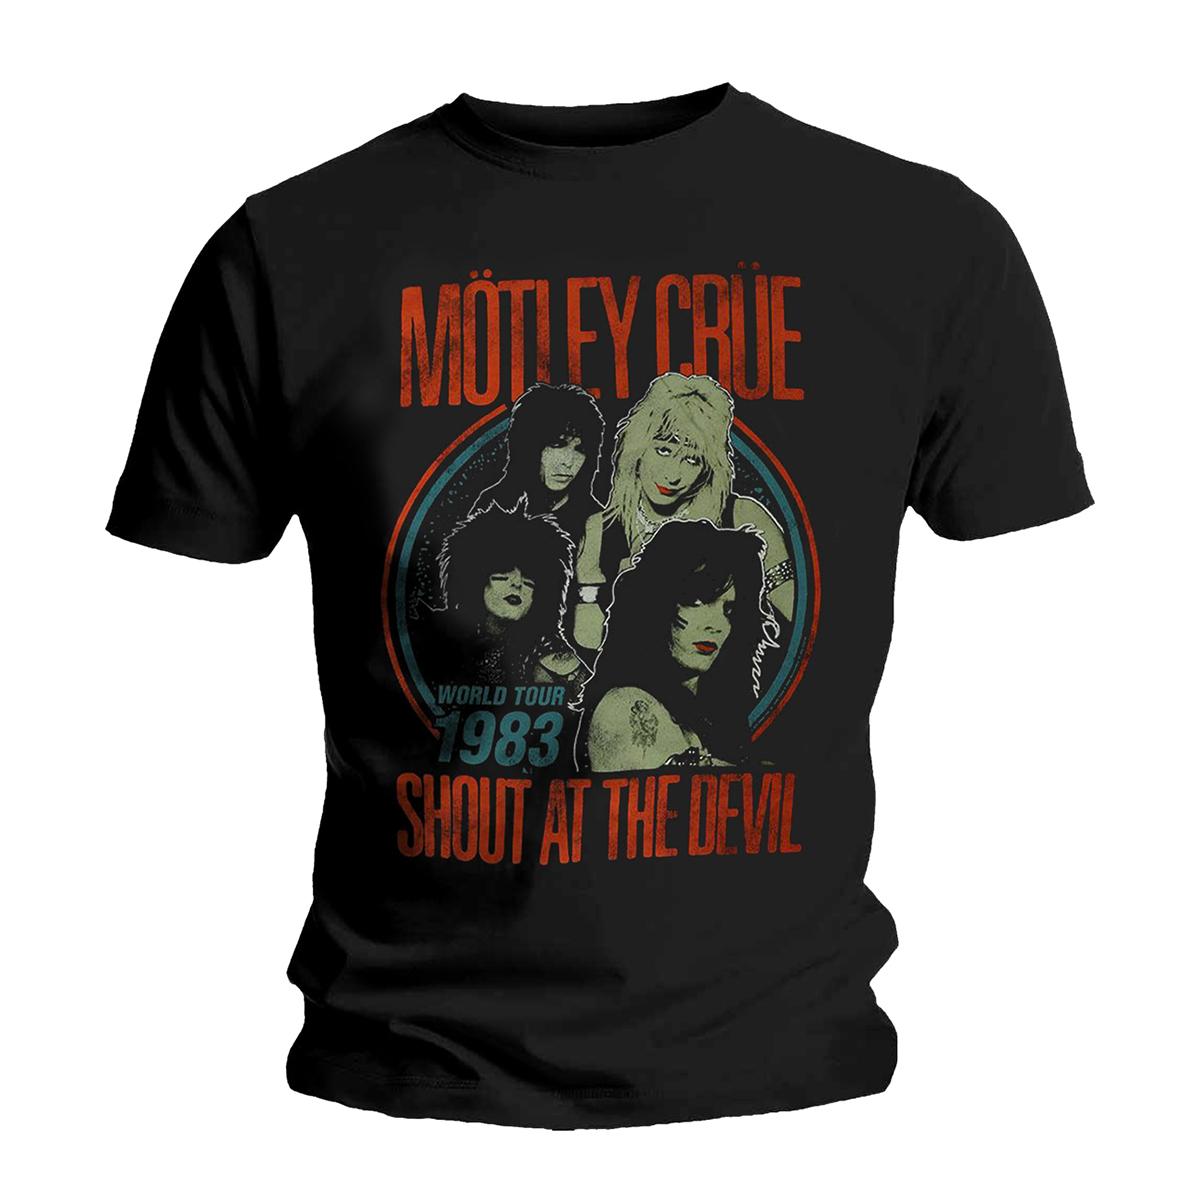 Mötley Crüe VINTAGE '83 SHOUT AT THE DEVIL T-SHIRT